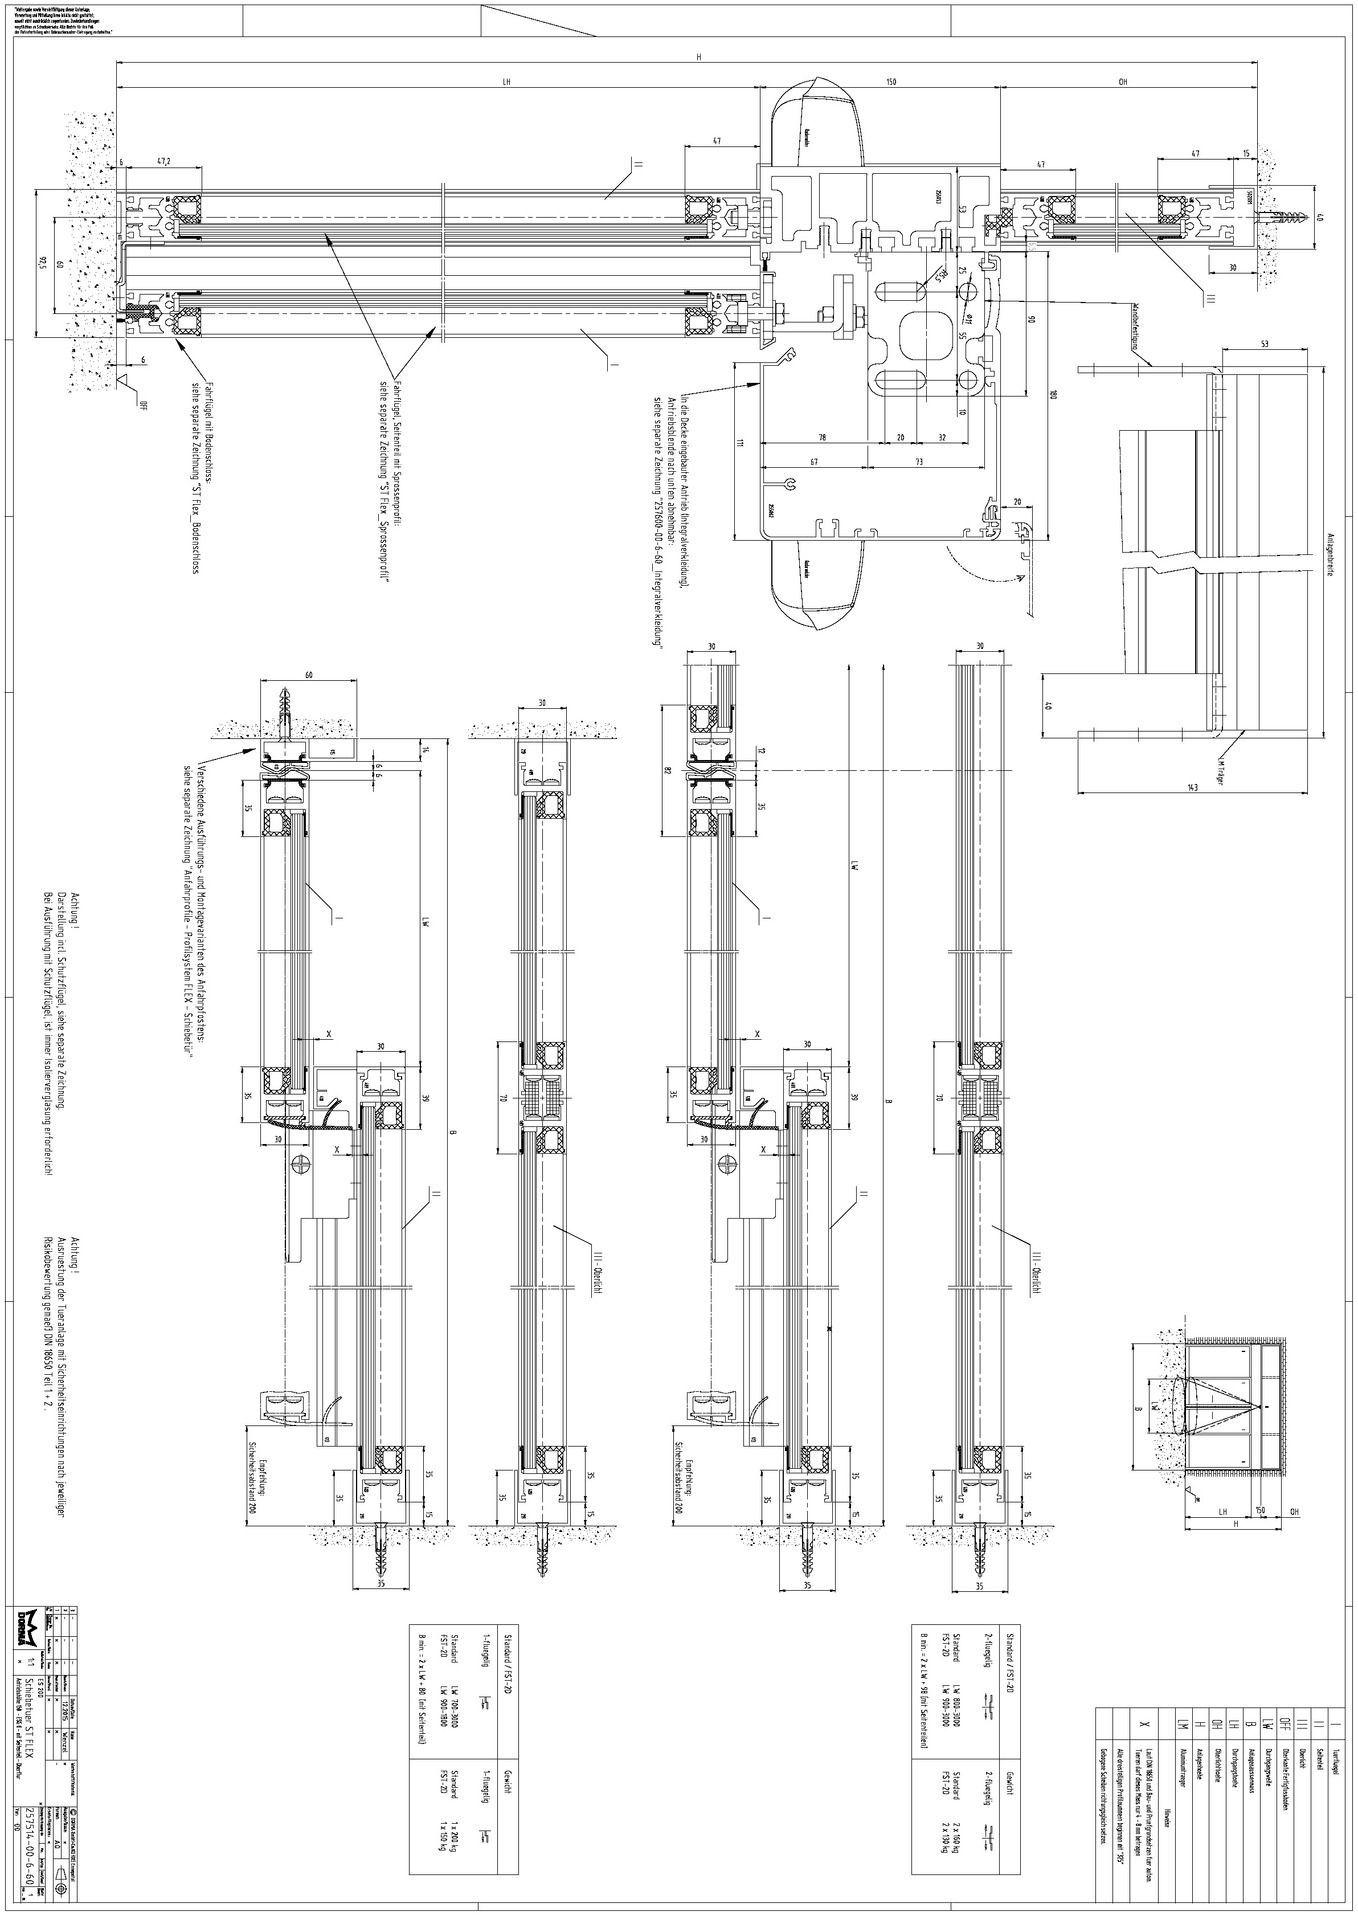 Schiebetür in trockenbauwand detail  CAD-Detail|ST Flex | dormakaba - heinze.de